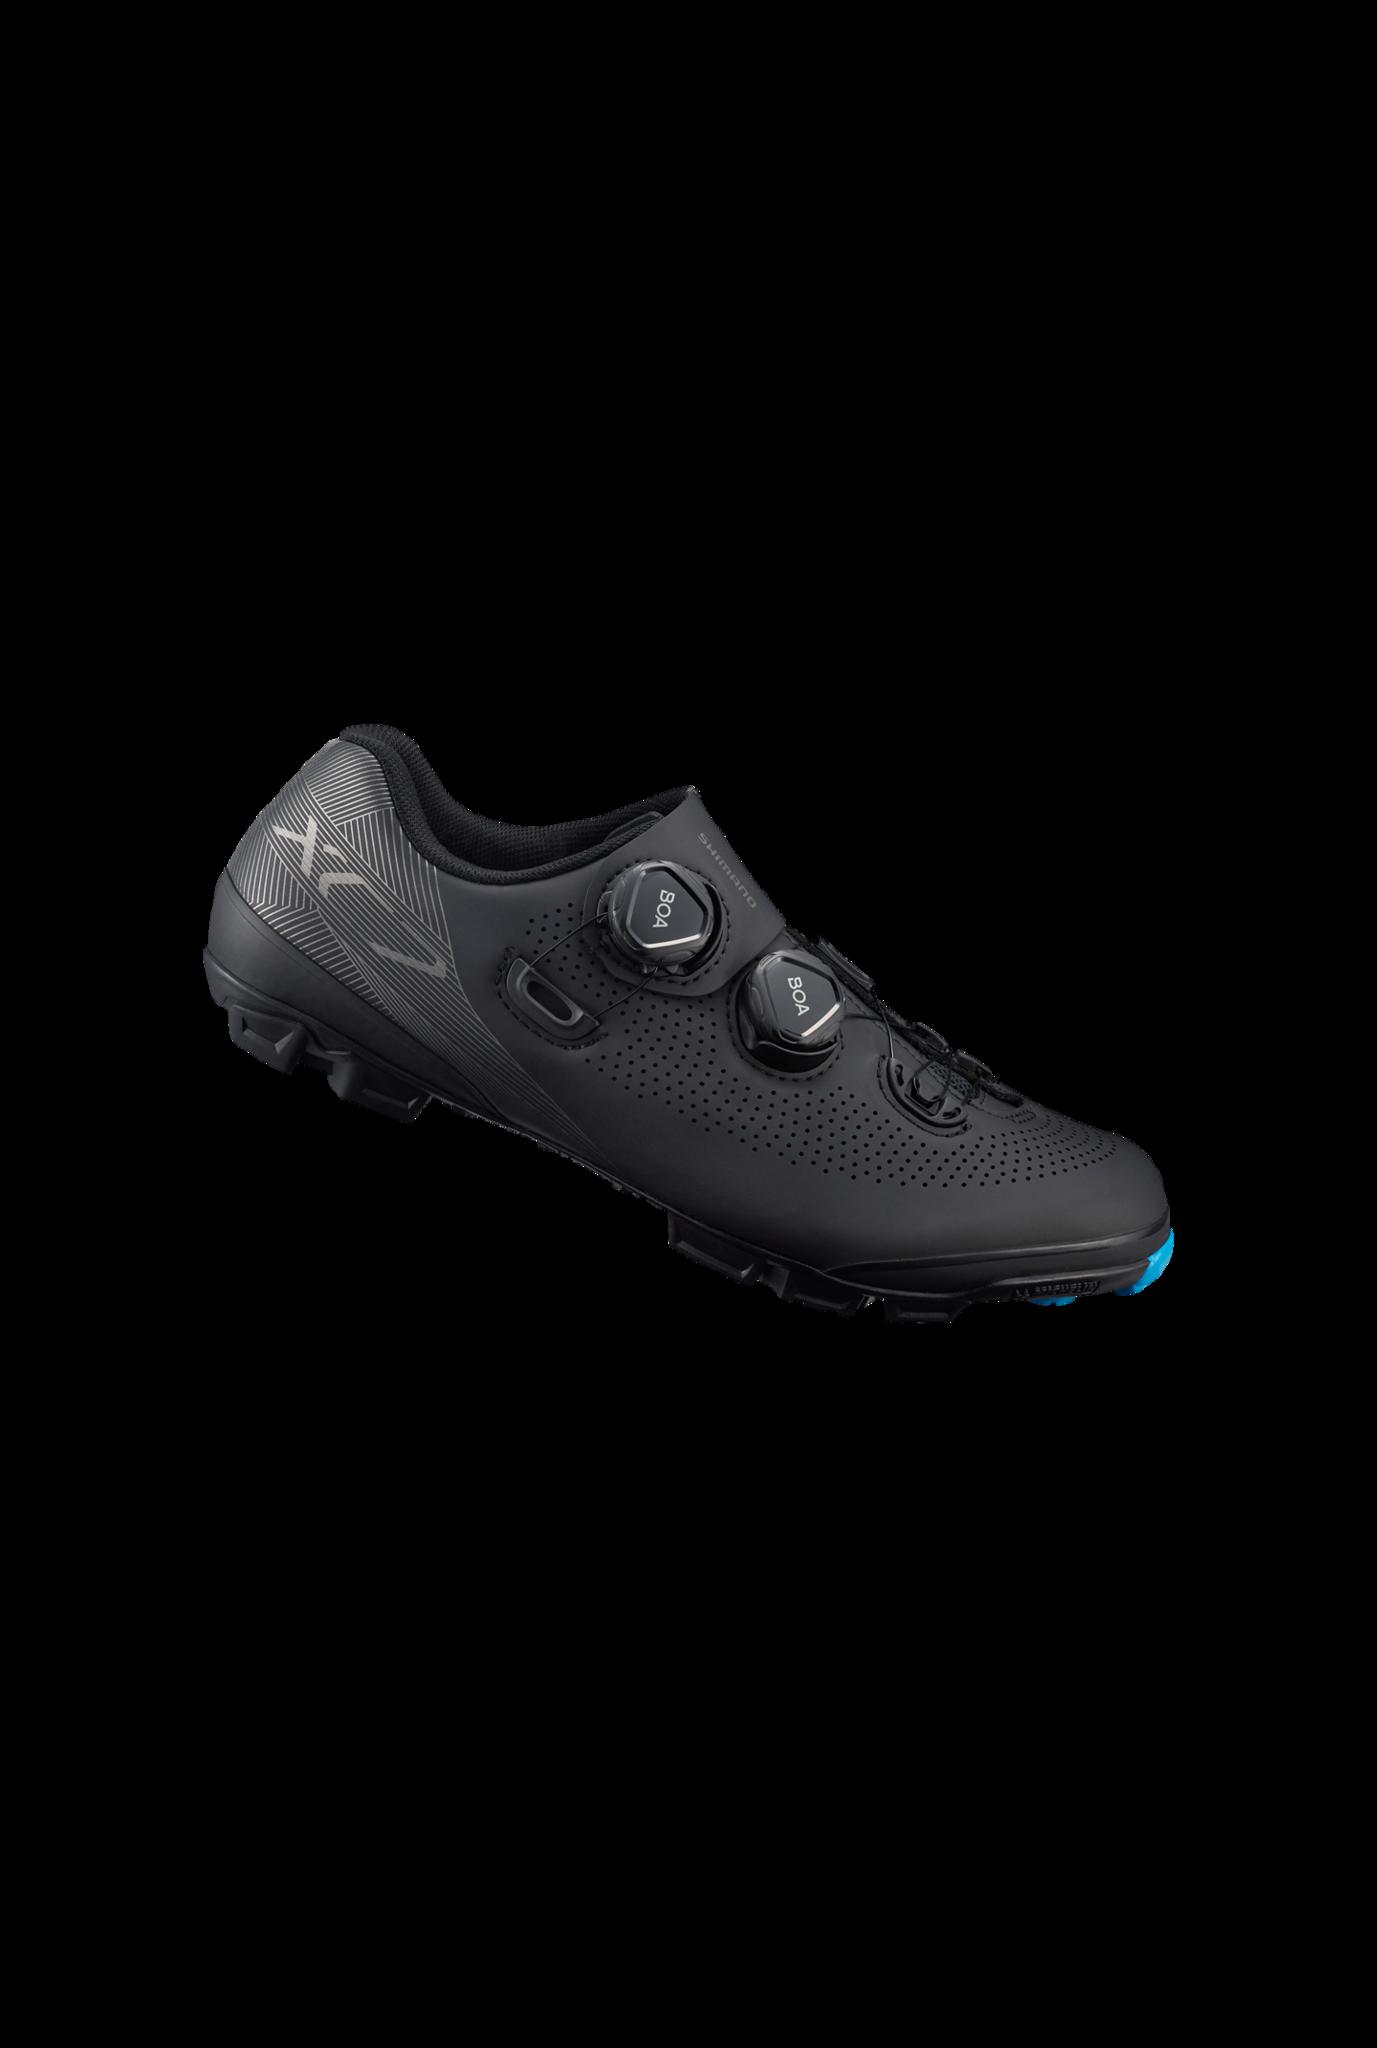 Schoenen XC701 Zwart-1